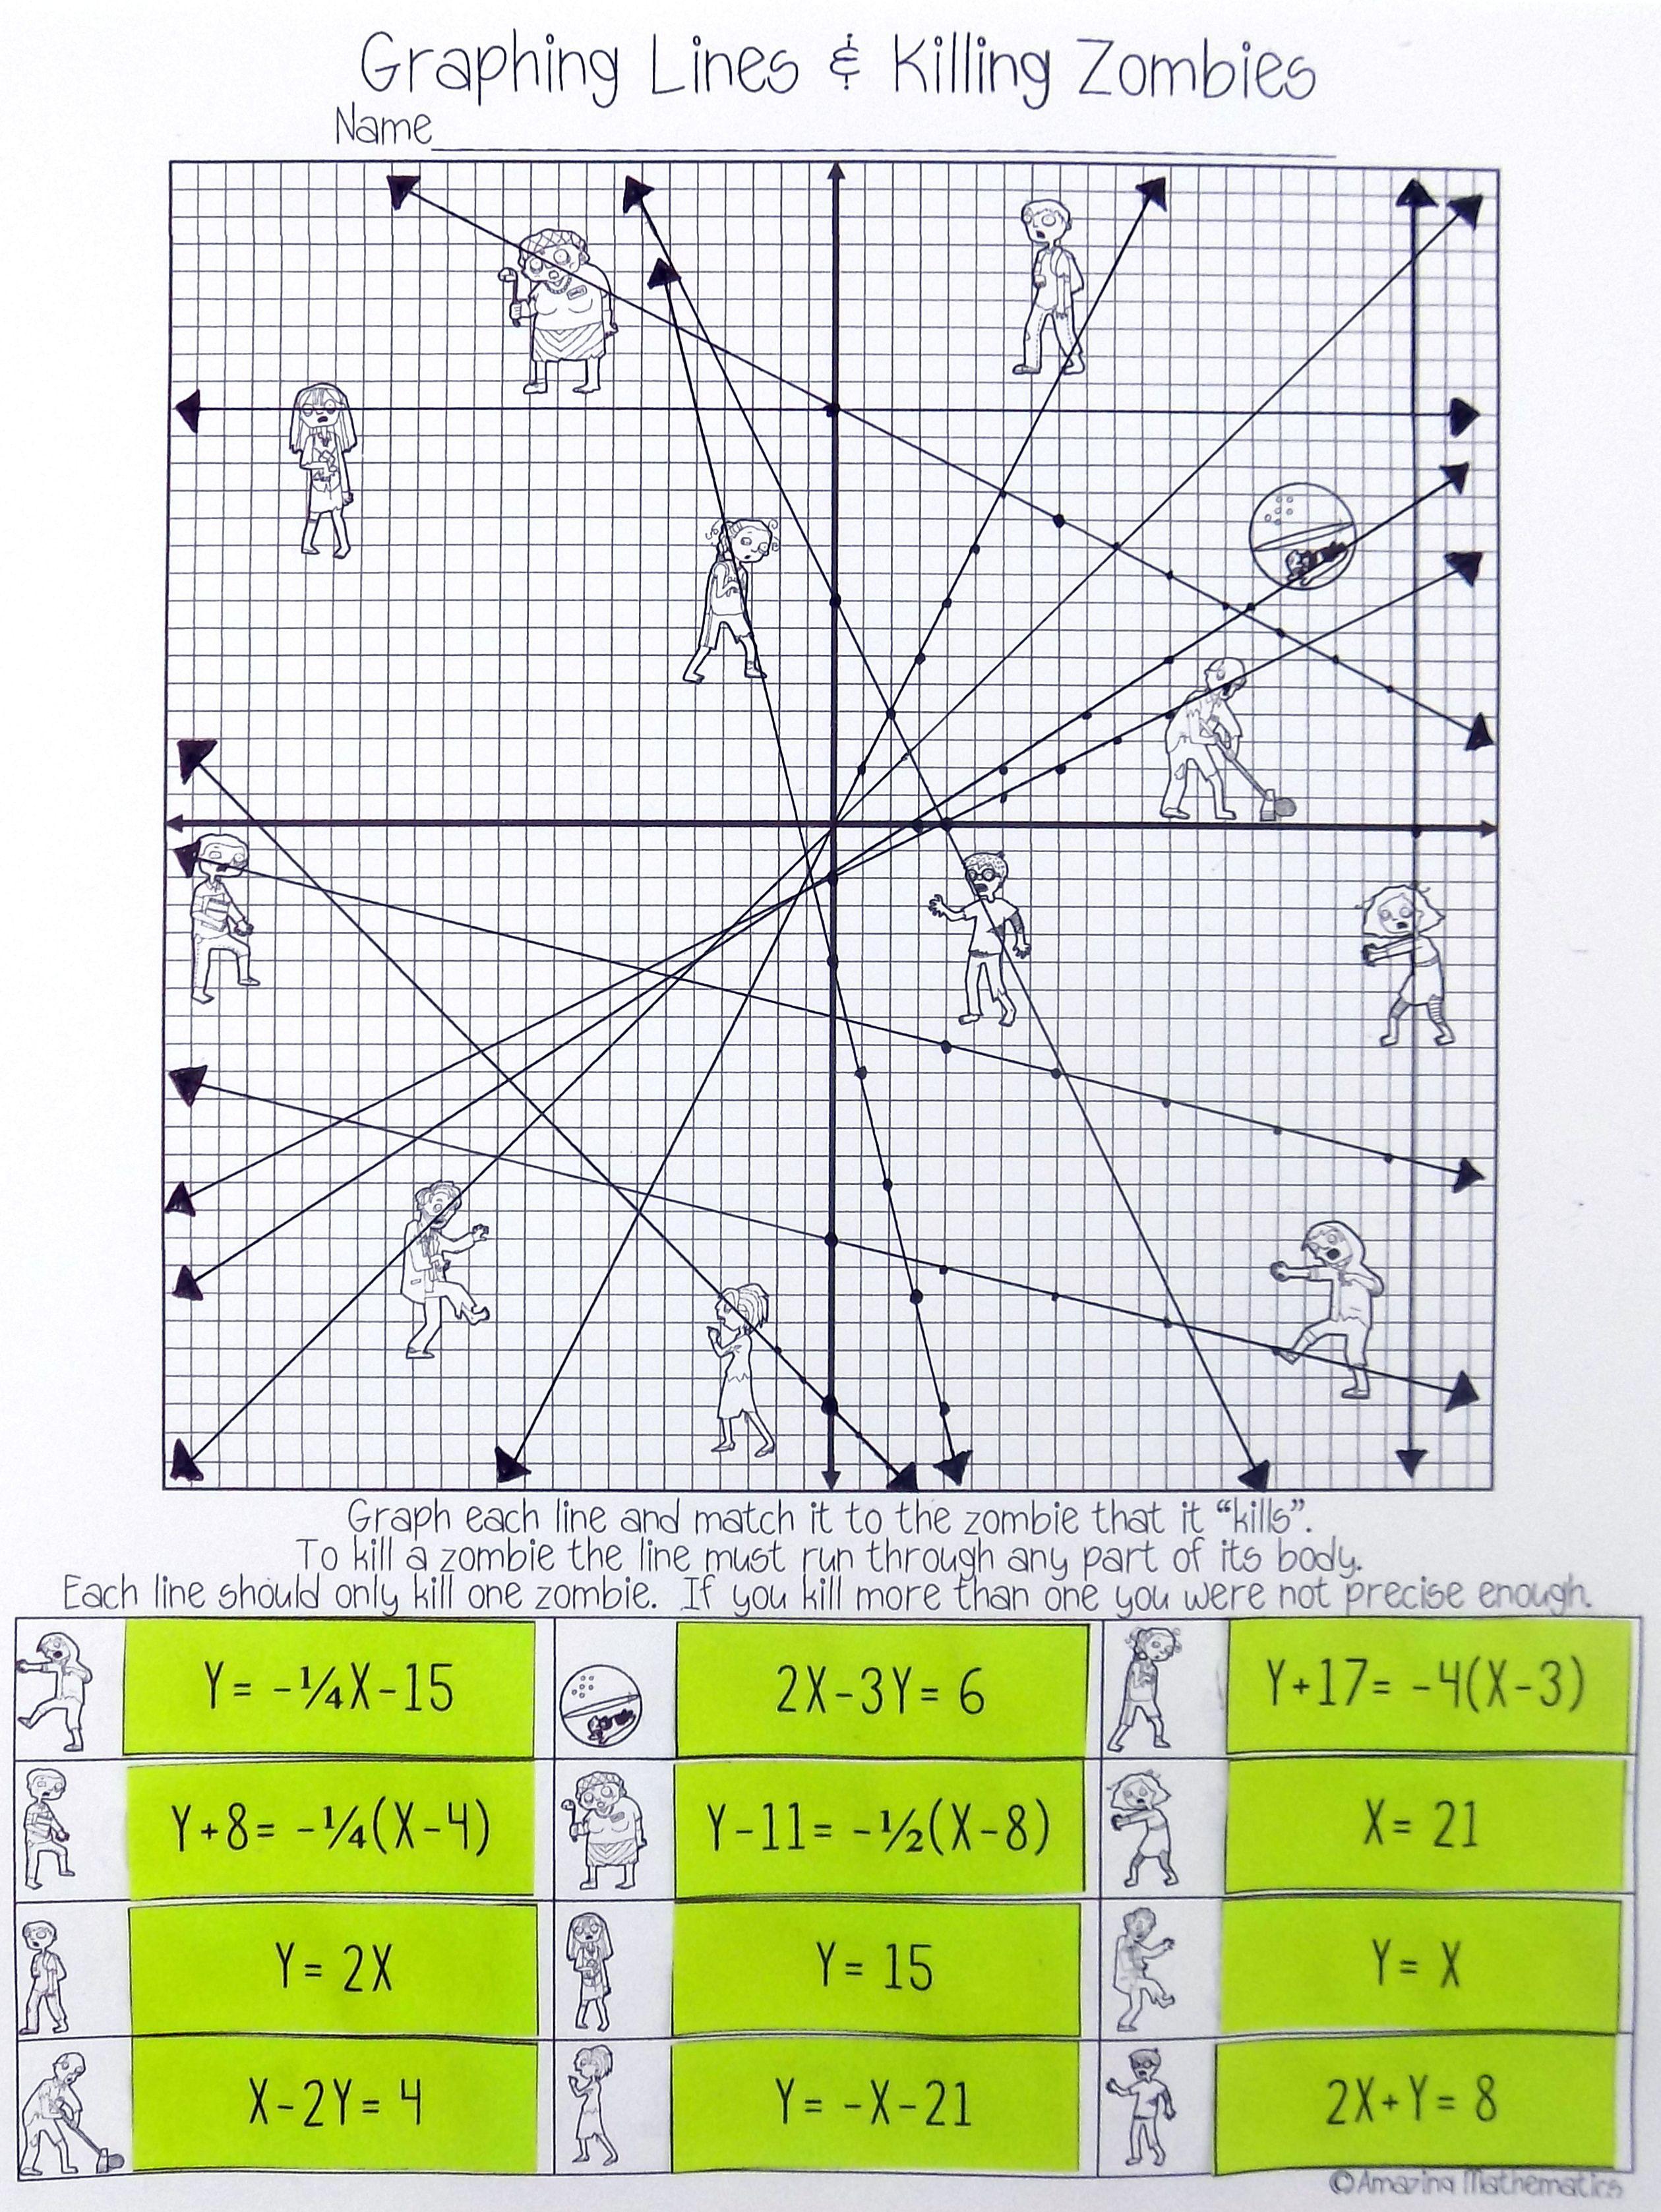 worksheet Graphing Linear Equations Worksheet graphing linear equations homework help pictures worksheet beatlesblogcarnival beatlesblogcarnival